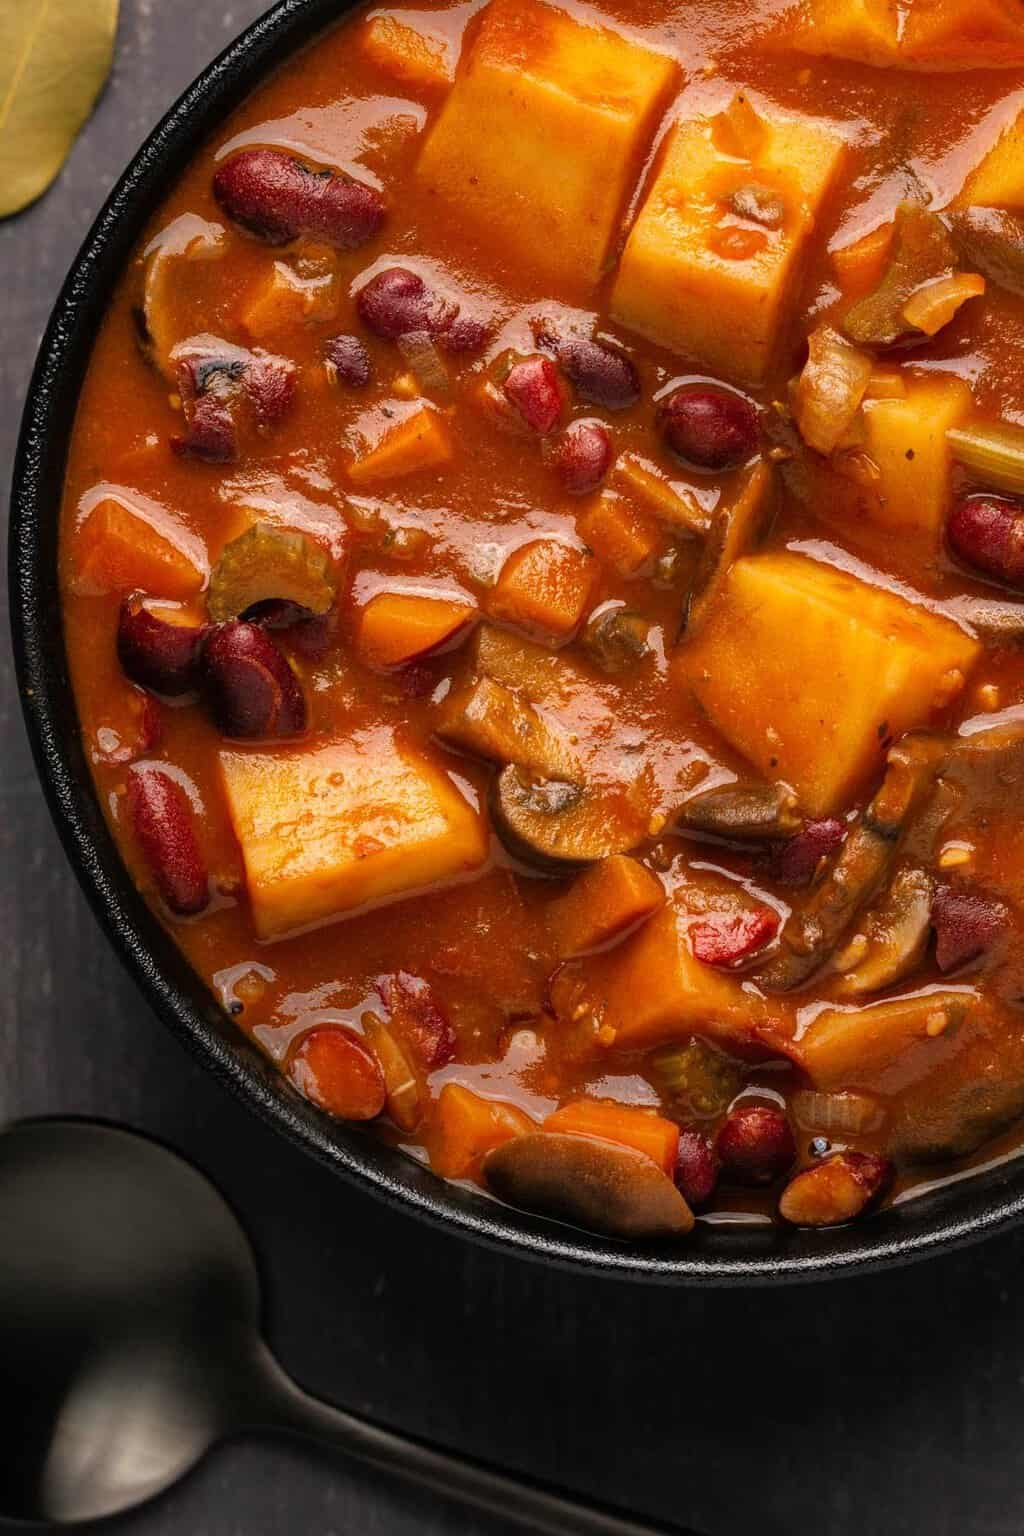 Vegan stew in a black bowl.